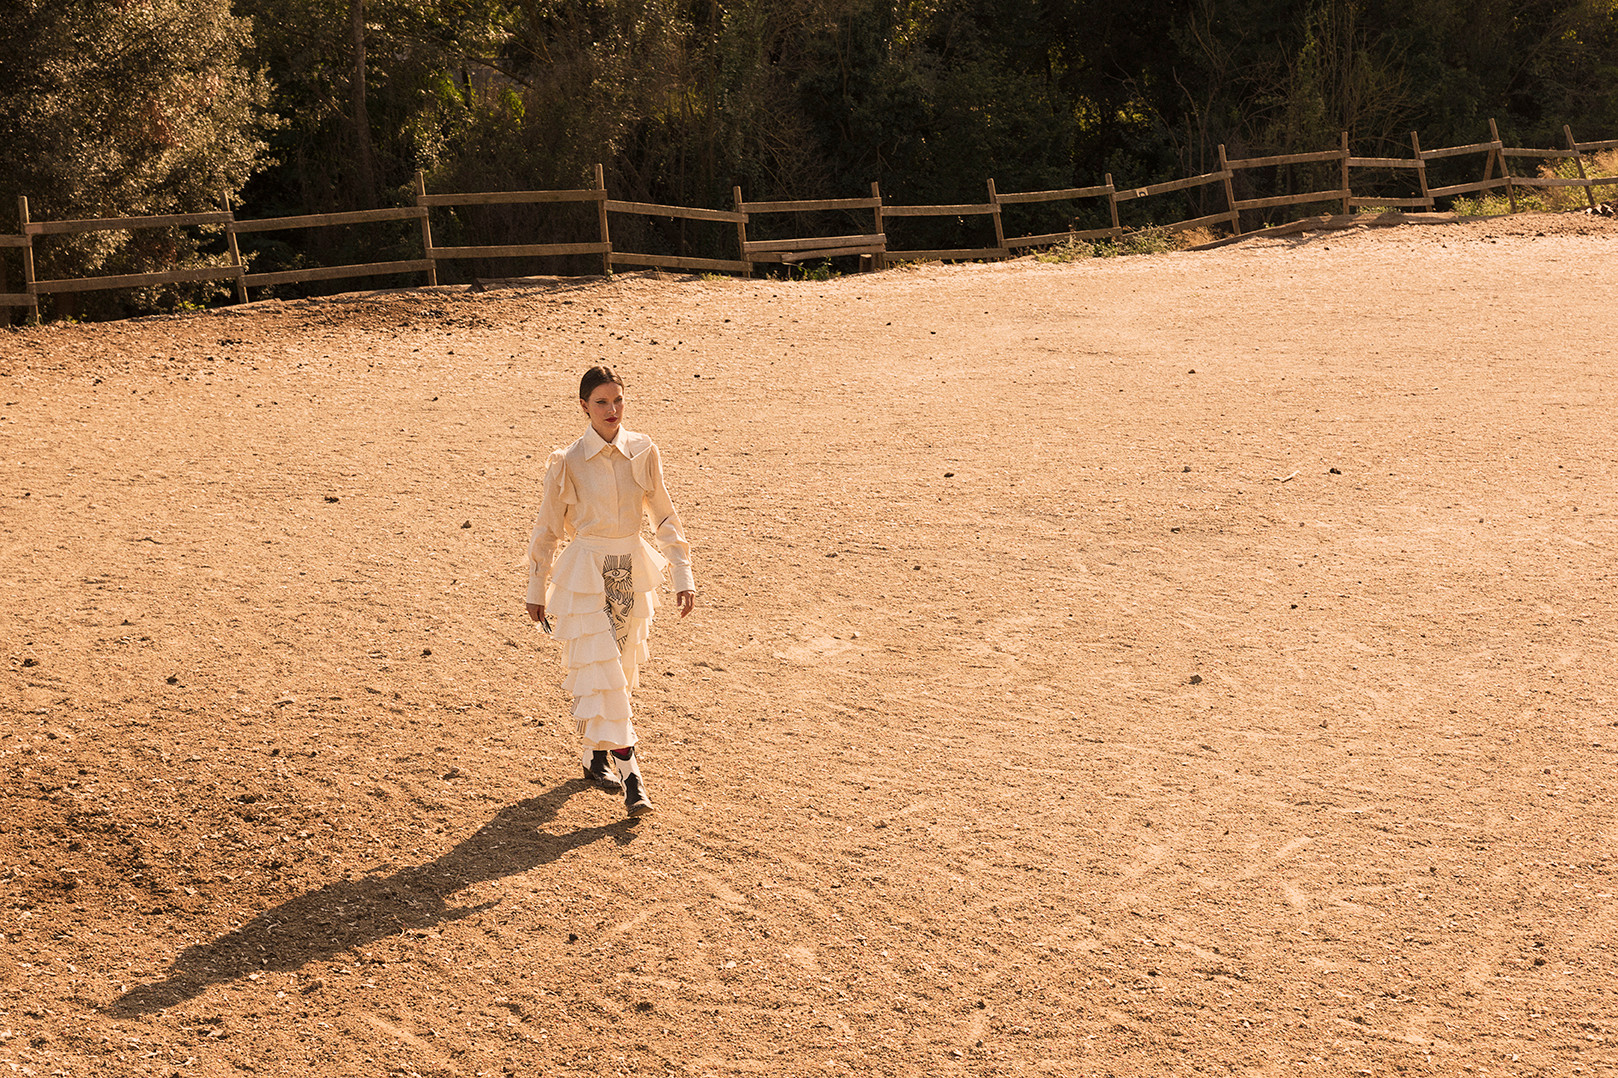 BullfighterRedemption_LuisAyora_02.jpg